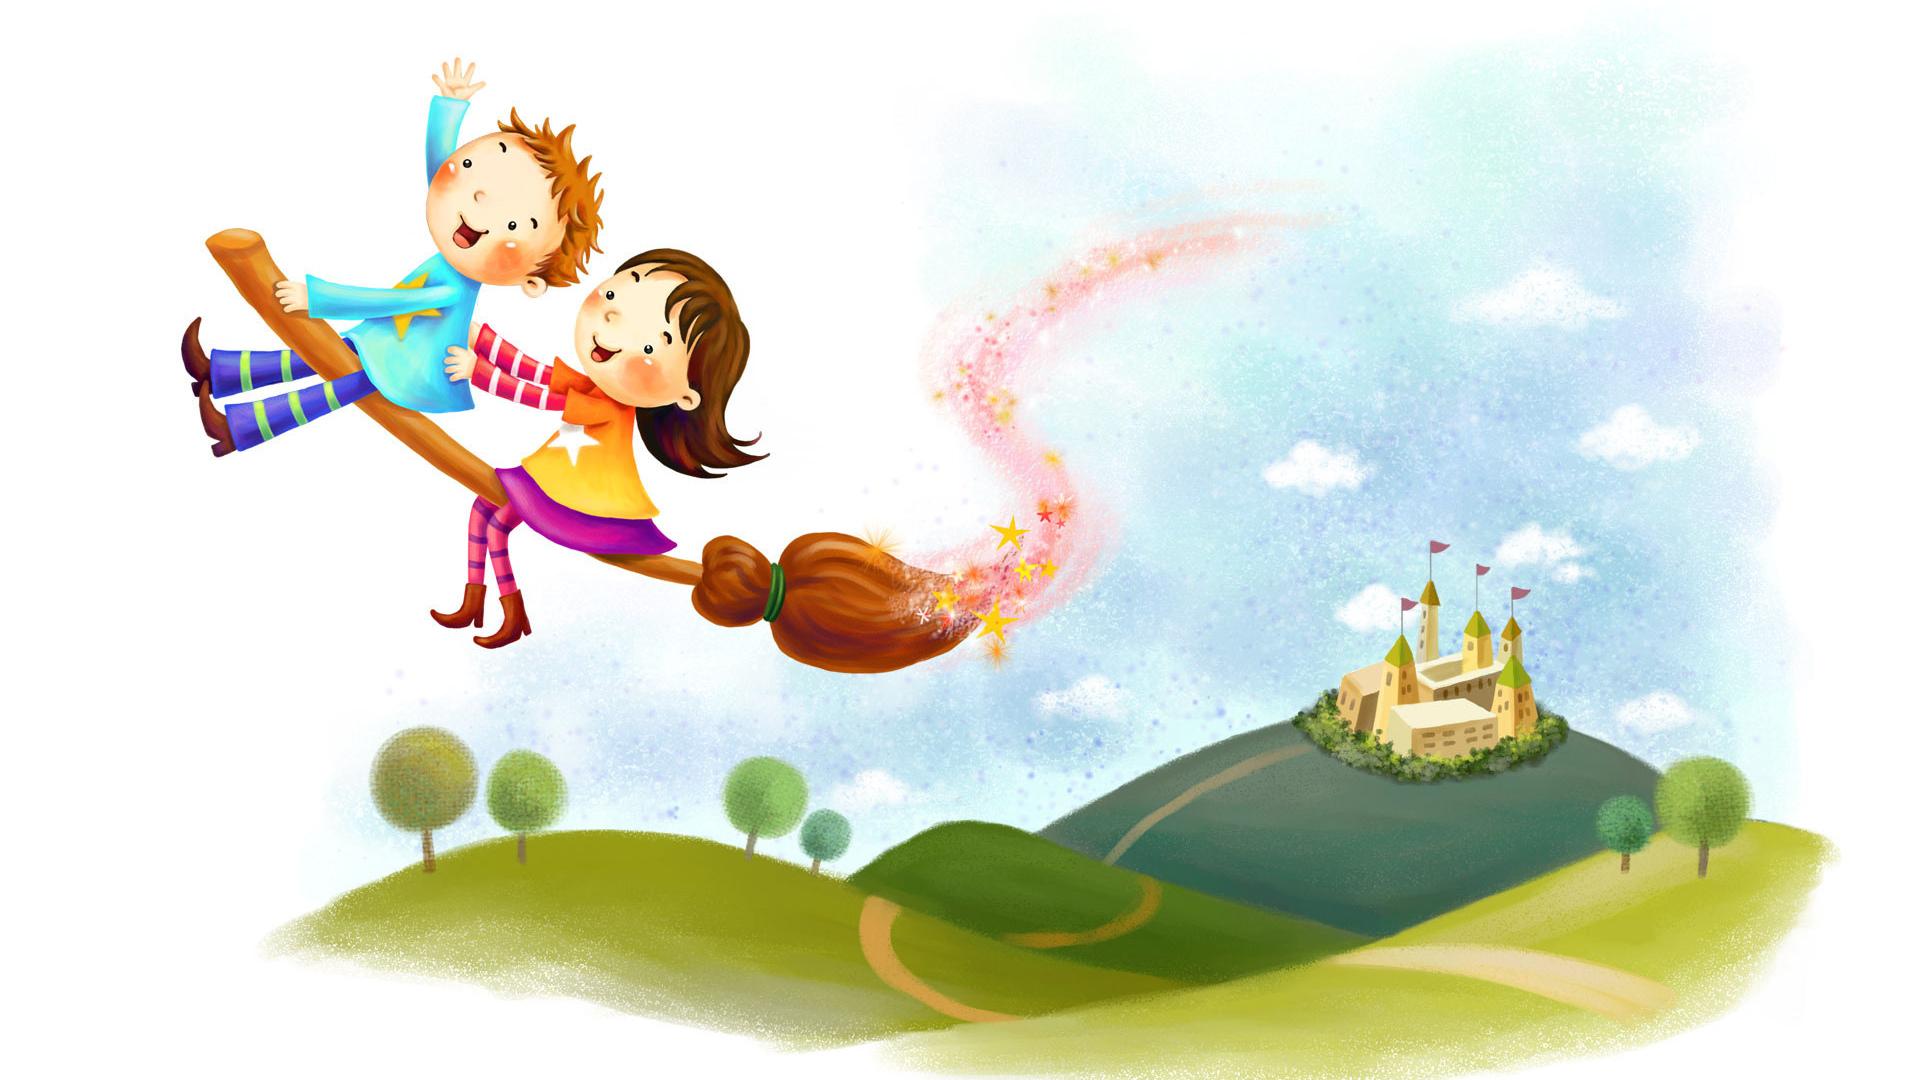 Волшебство рисунок детство фантазия